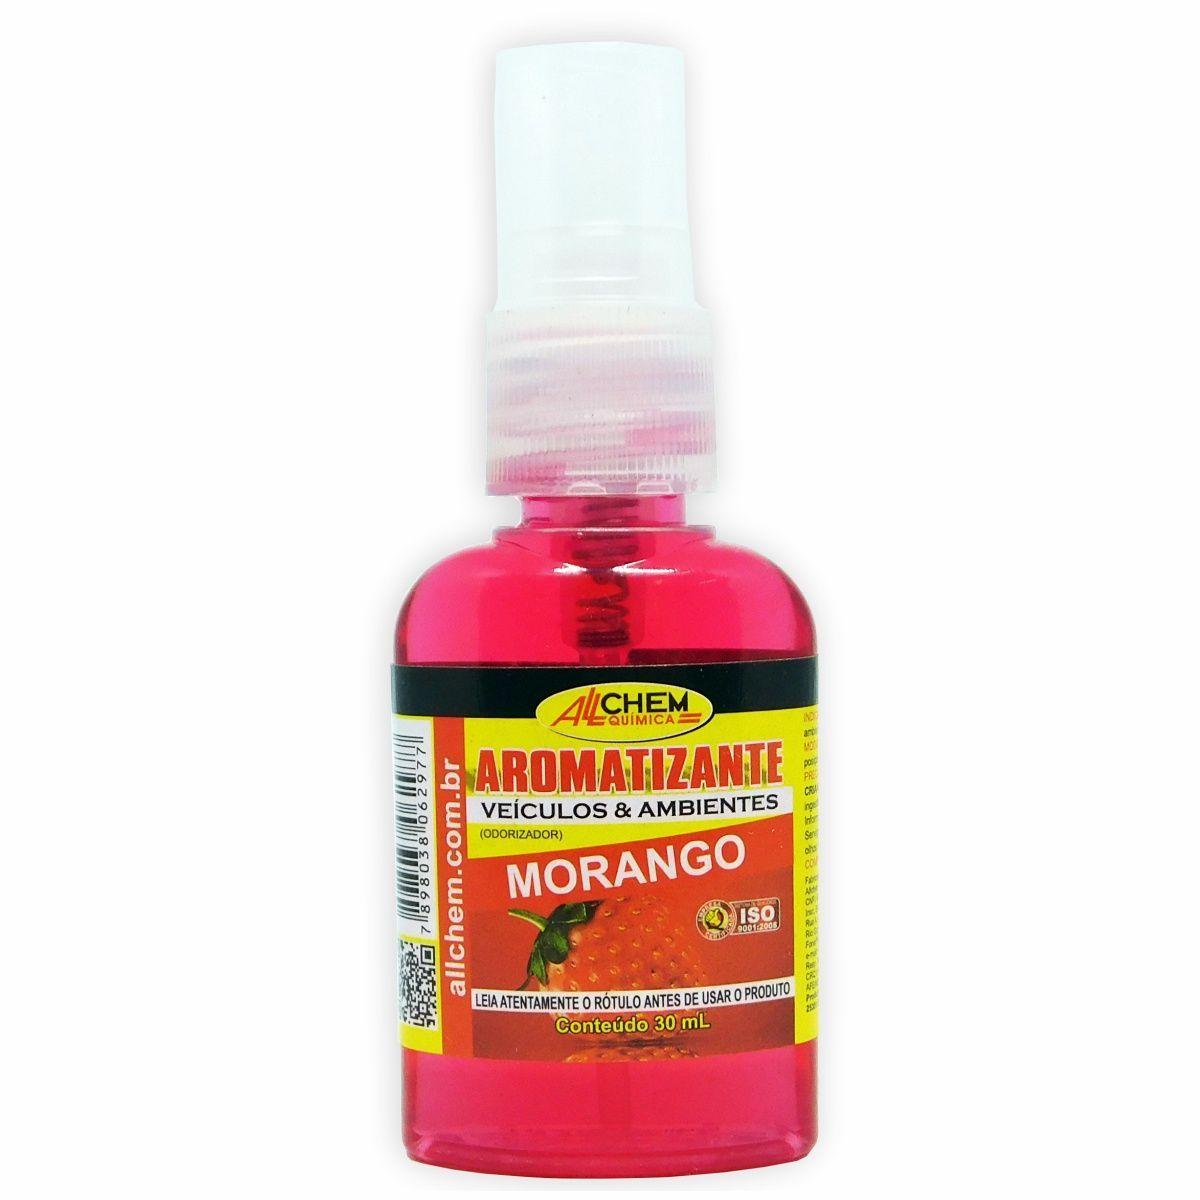 aromatizante-spray-morango-allchem